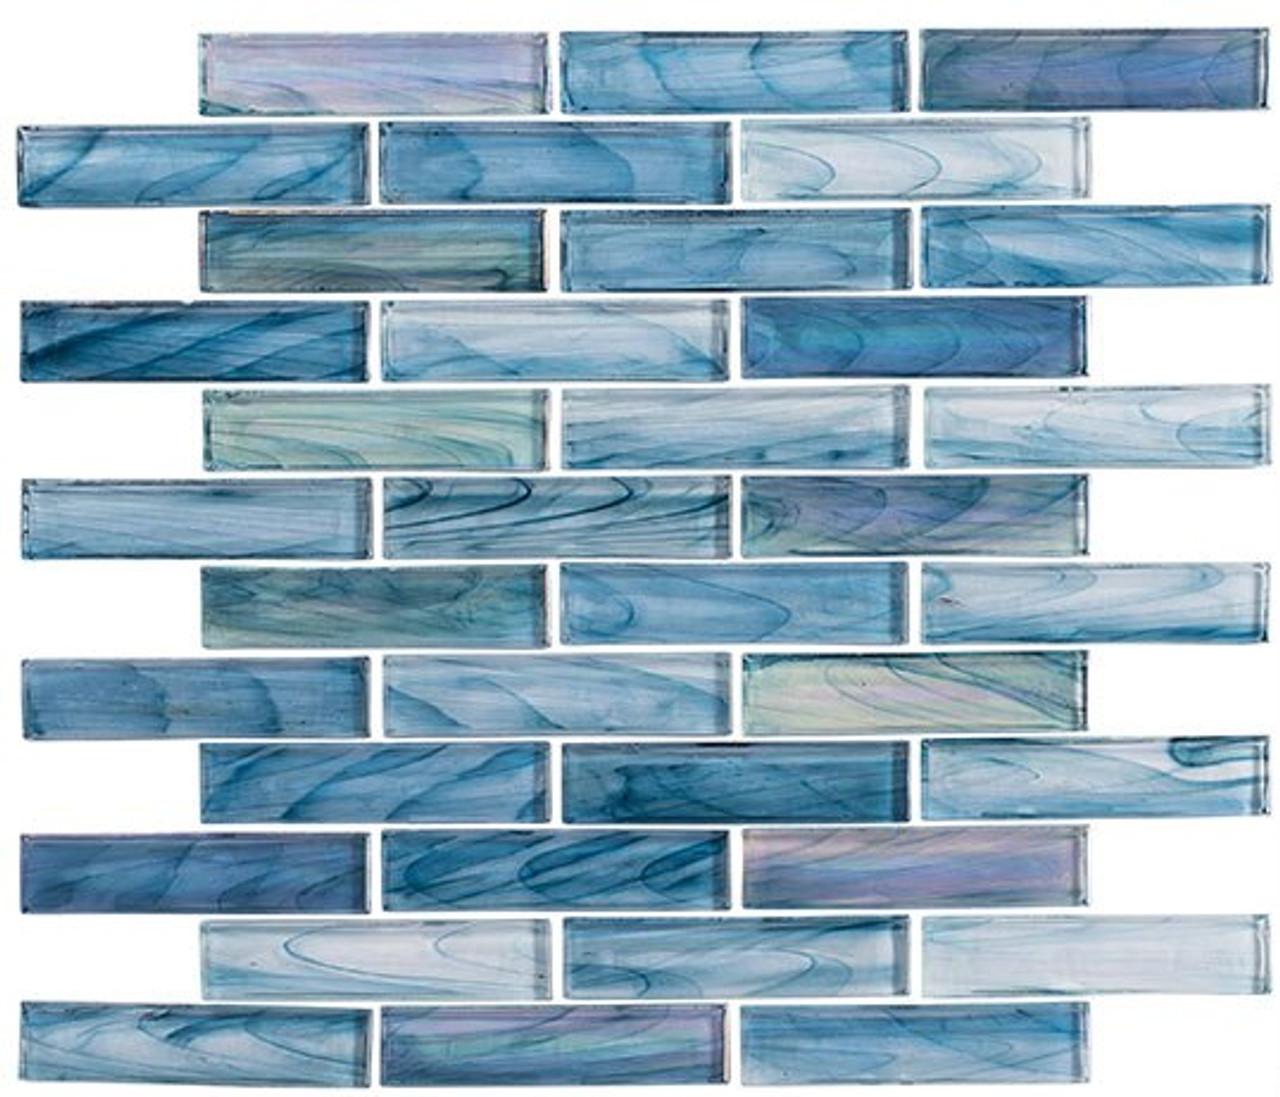 Bella Glass Tiles Oyster Cove Series Galapagos Deep OTC1201